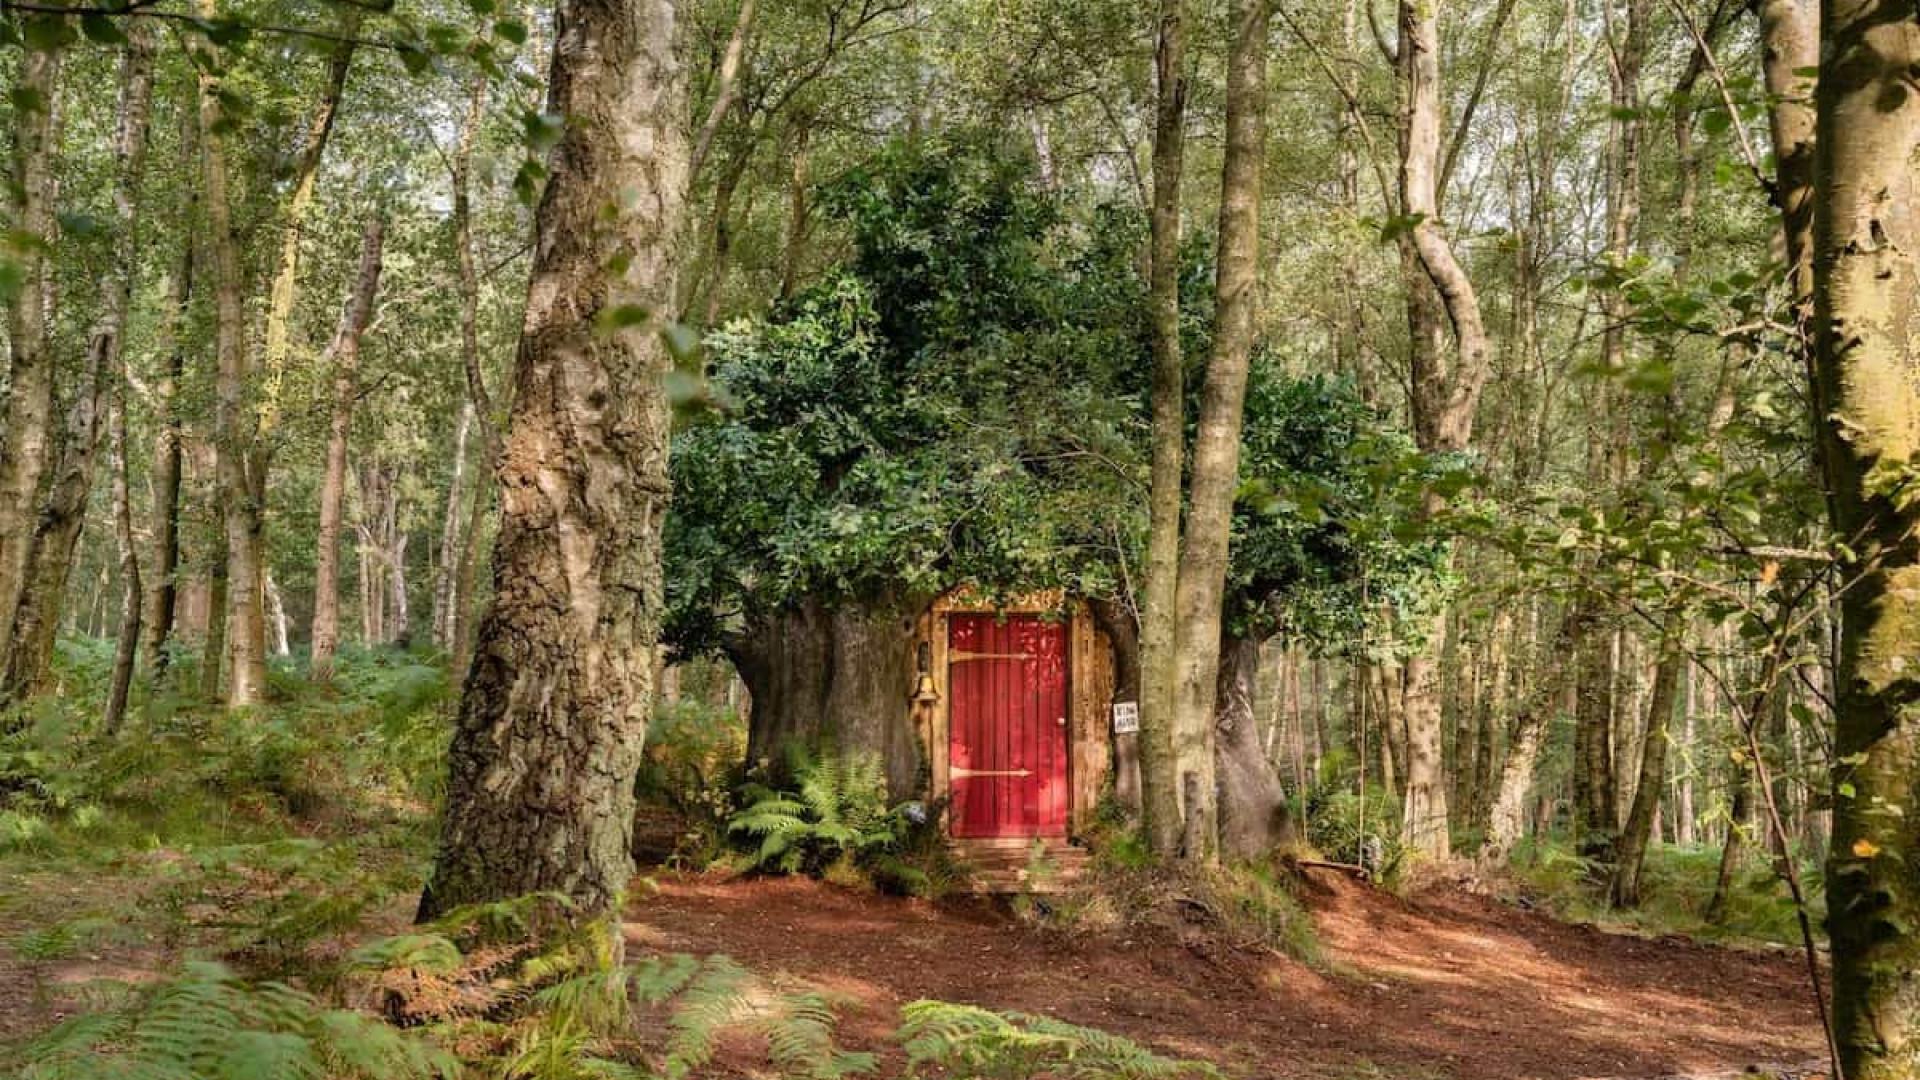 Casa de 'Winnie the Pooh' disponível para arrendar no Airbnb